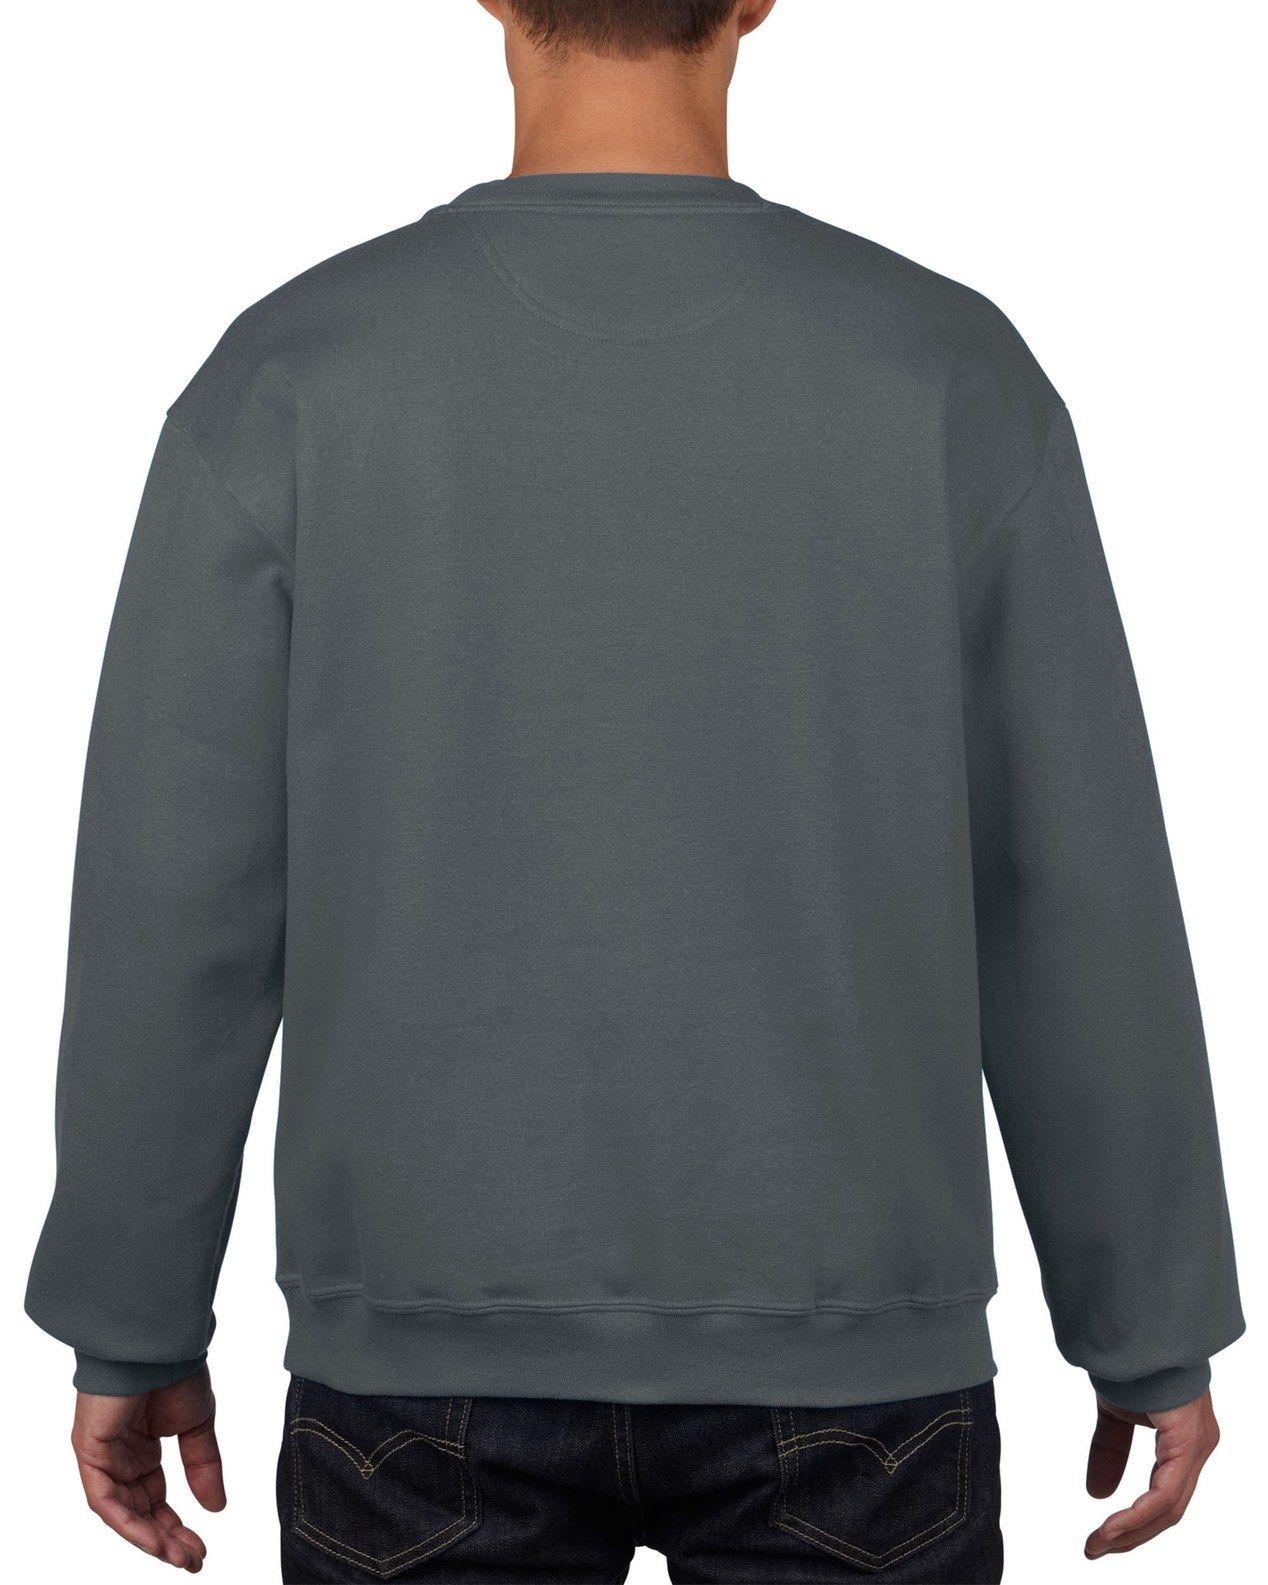 Pin On Sweatshirts For Teams [ 1585 x 1268 Pixel ]